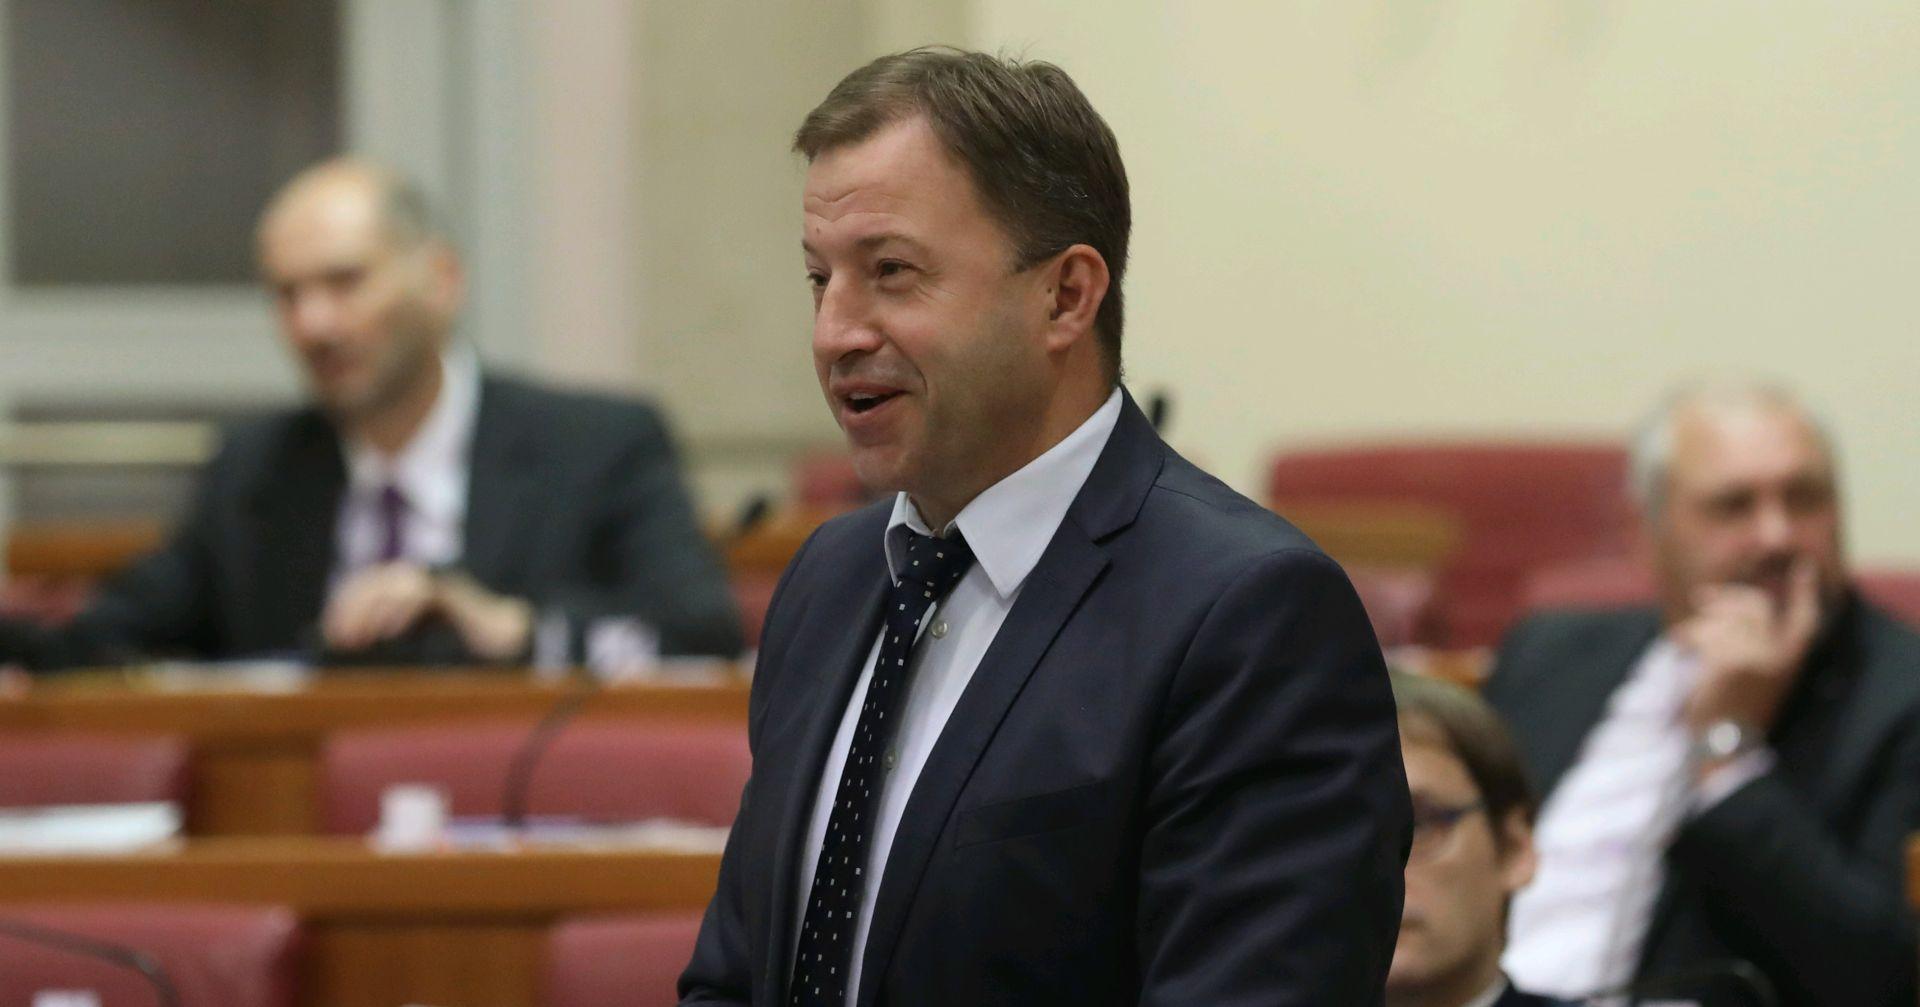 Panenić prozvao Vladu zbog izvješća EK-a